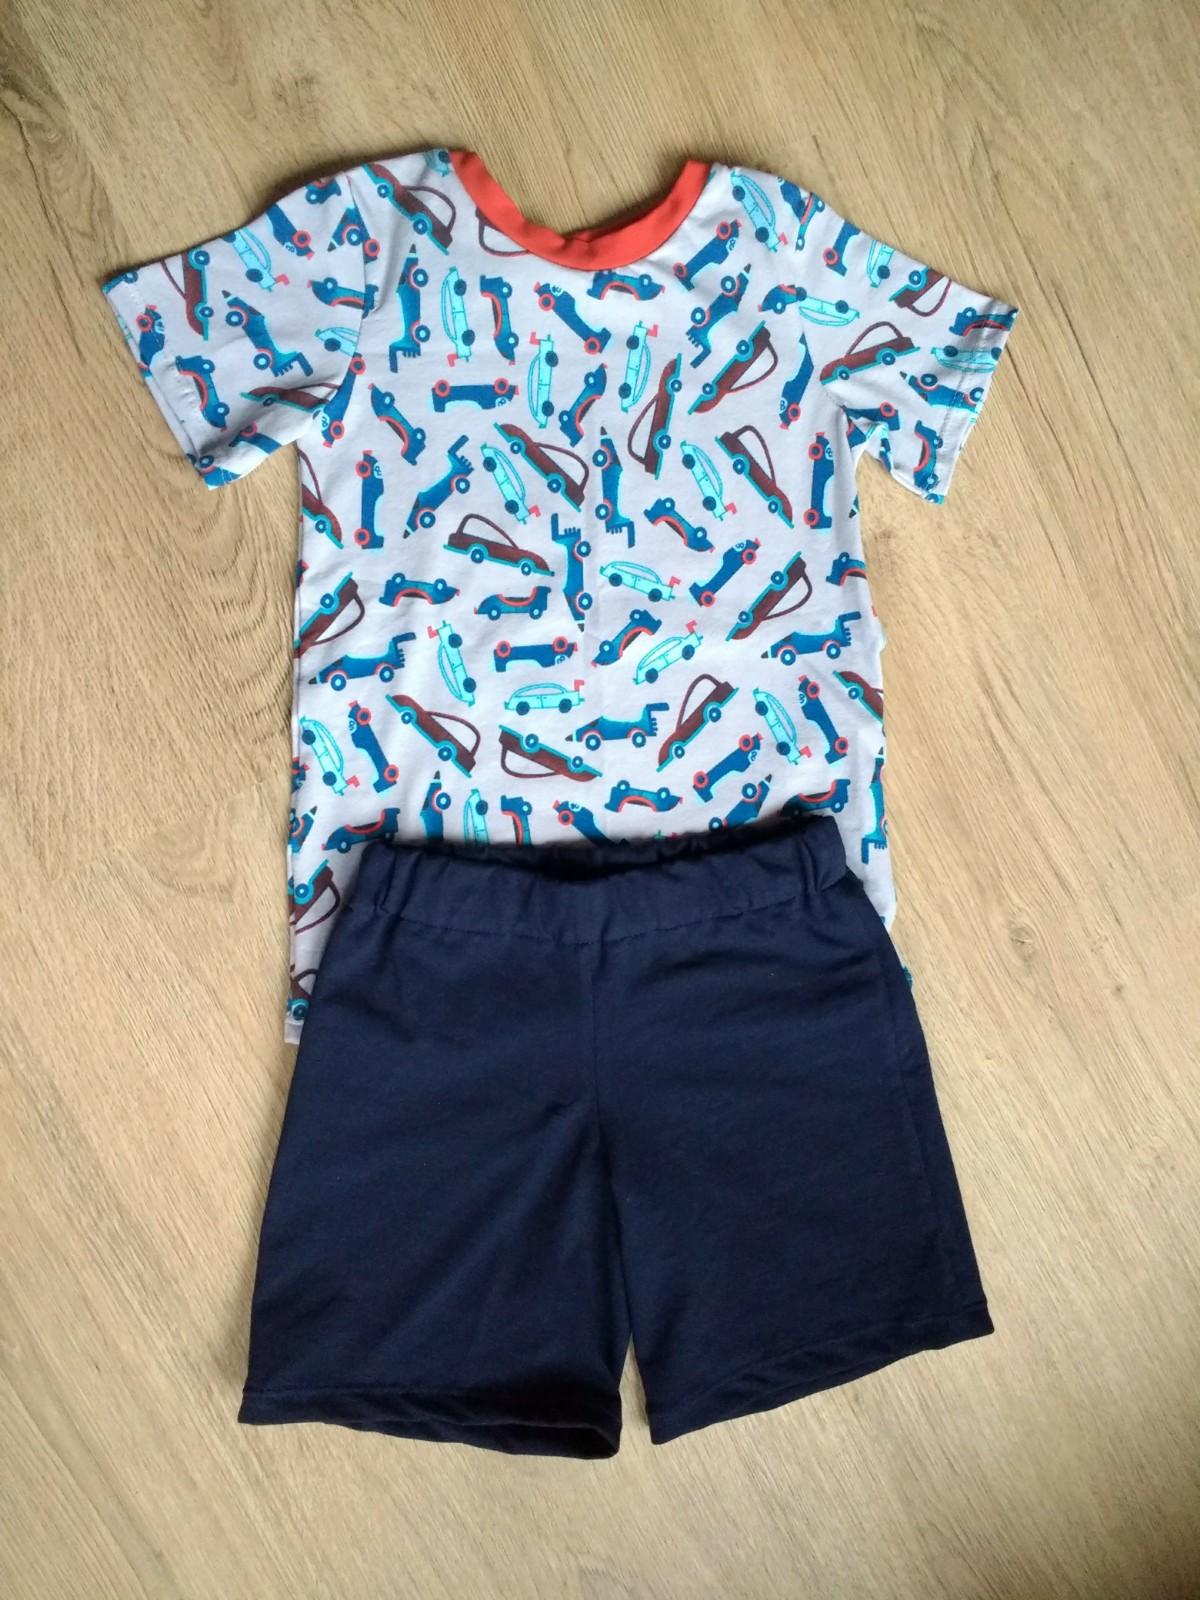 b6f5dac6ccf Pyjama voor T - Isaac T-shirt